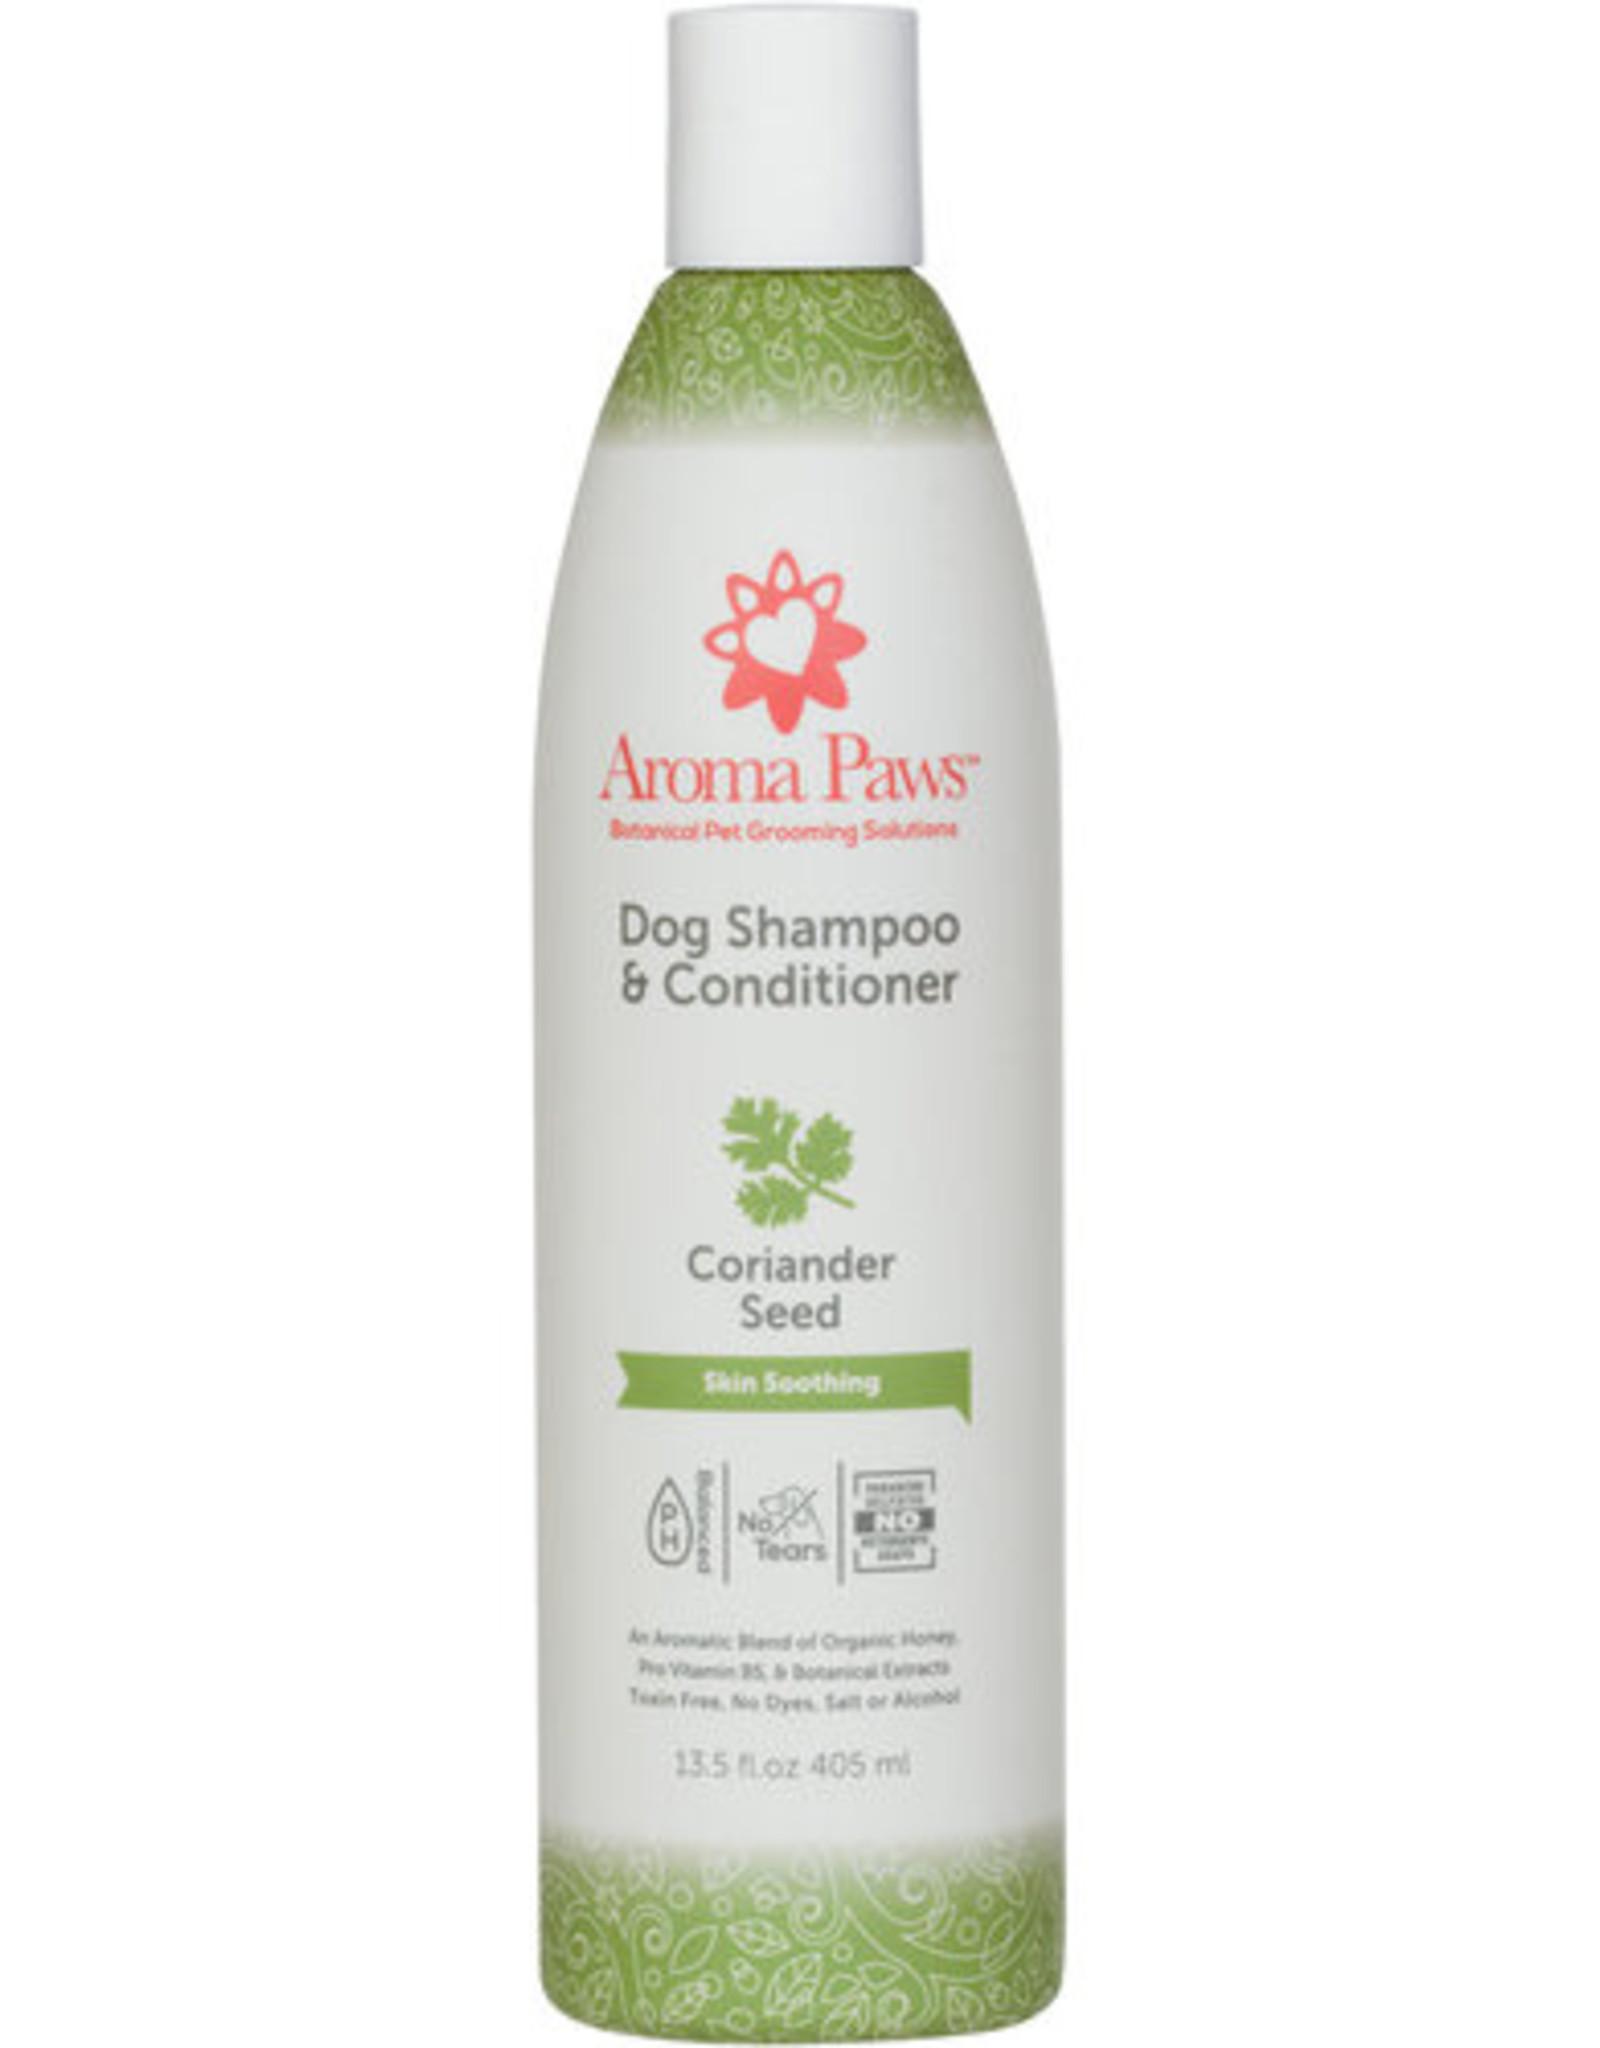 Aroma Paws Shampoo - Coriander